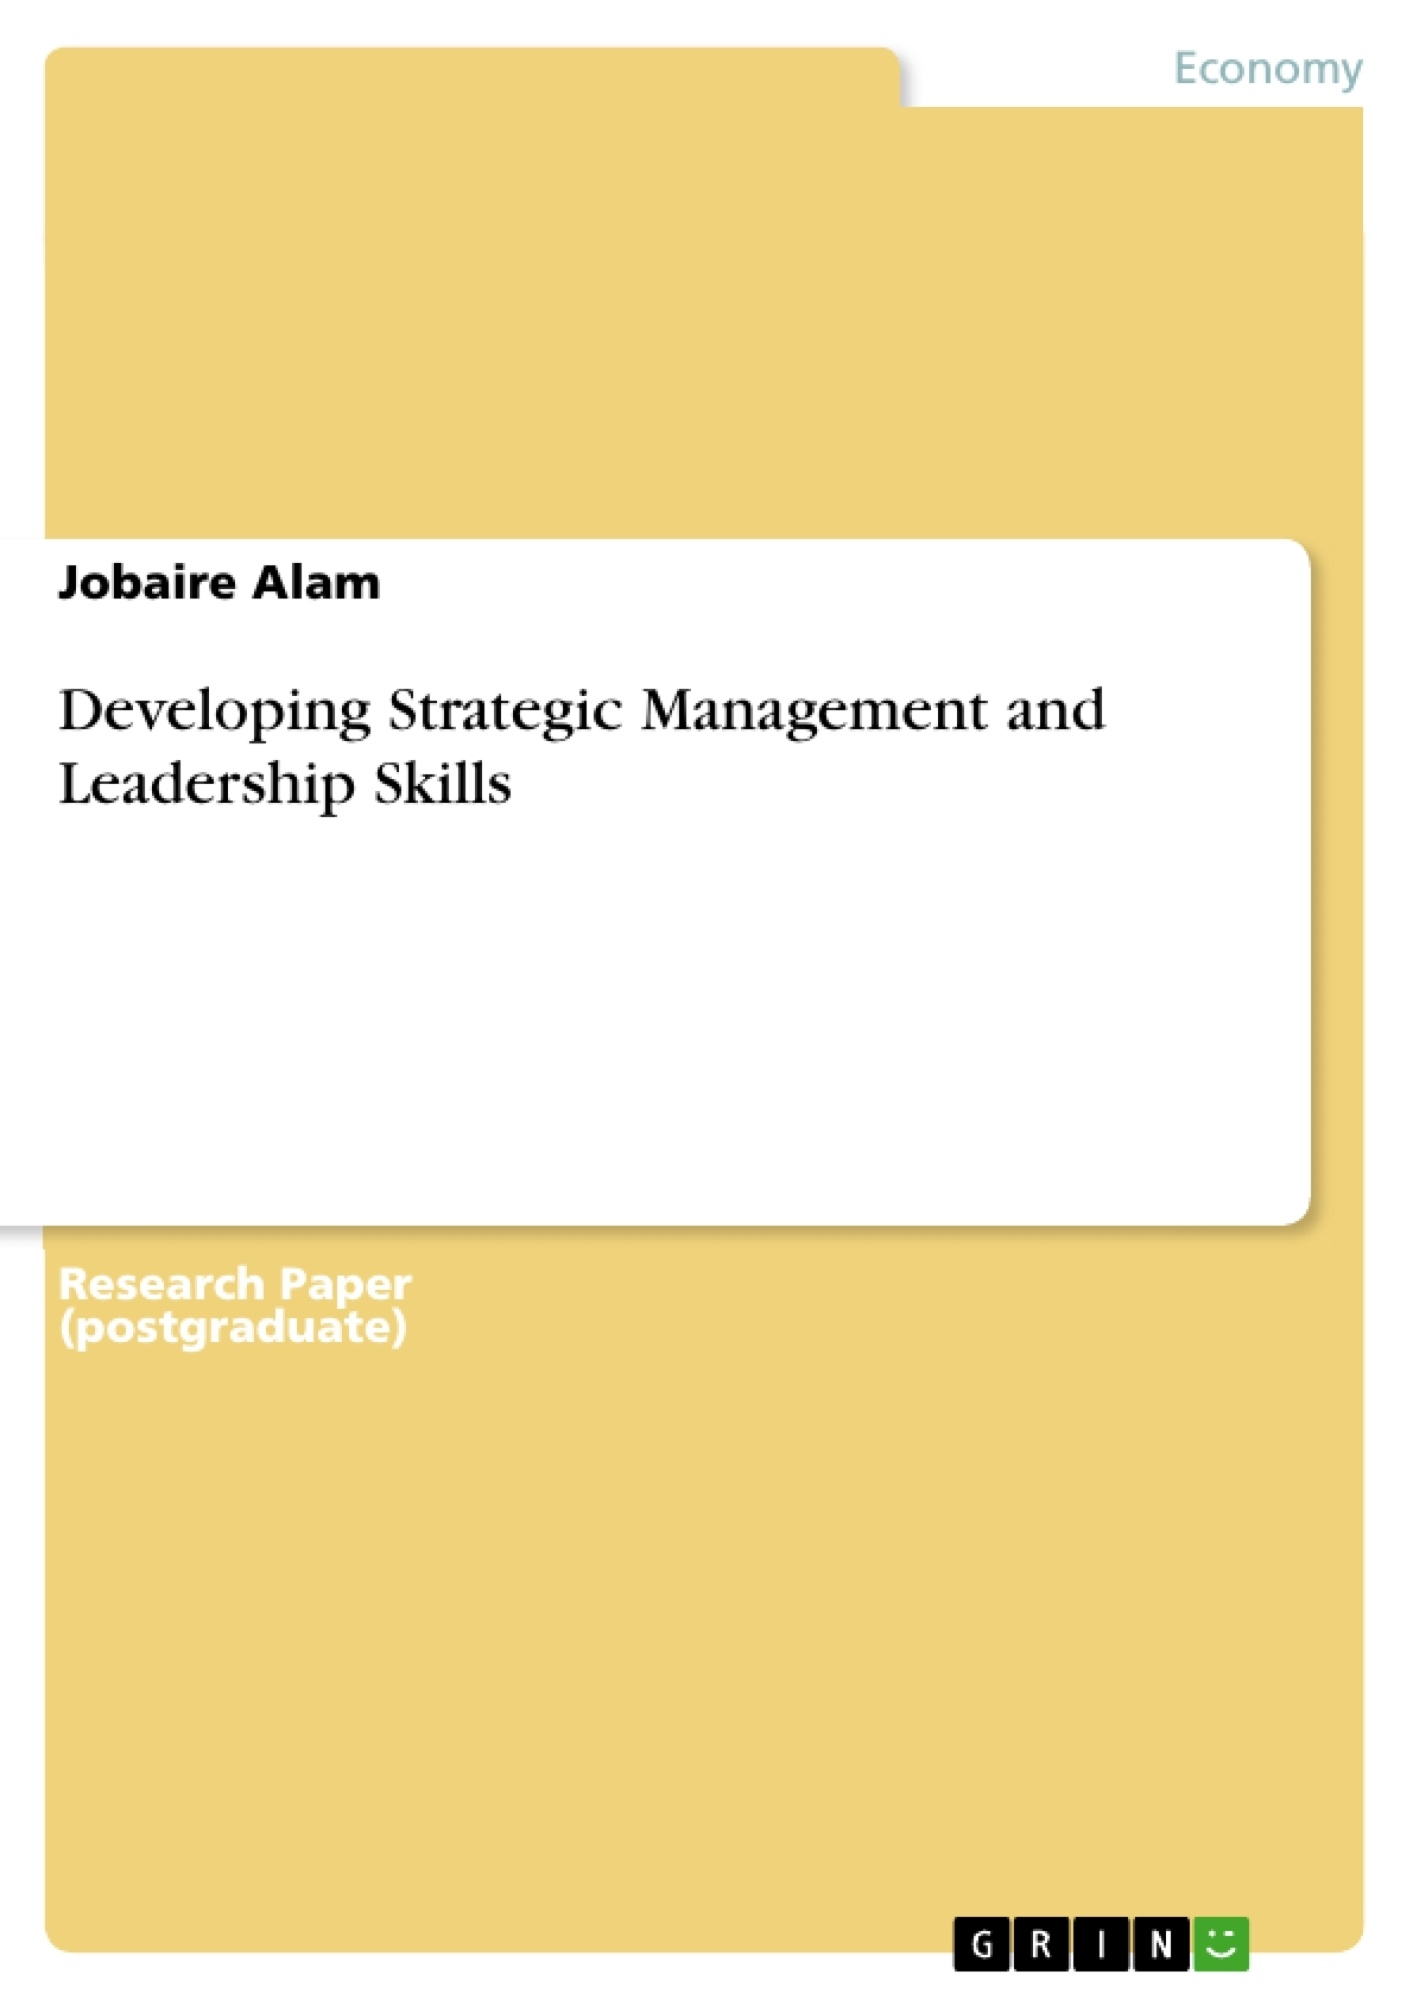 Title: Developing Strategic Management and Leadership Skills